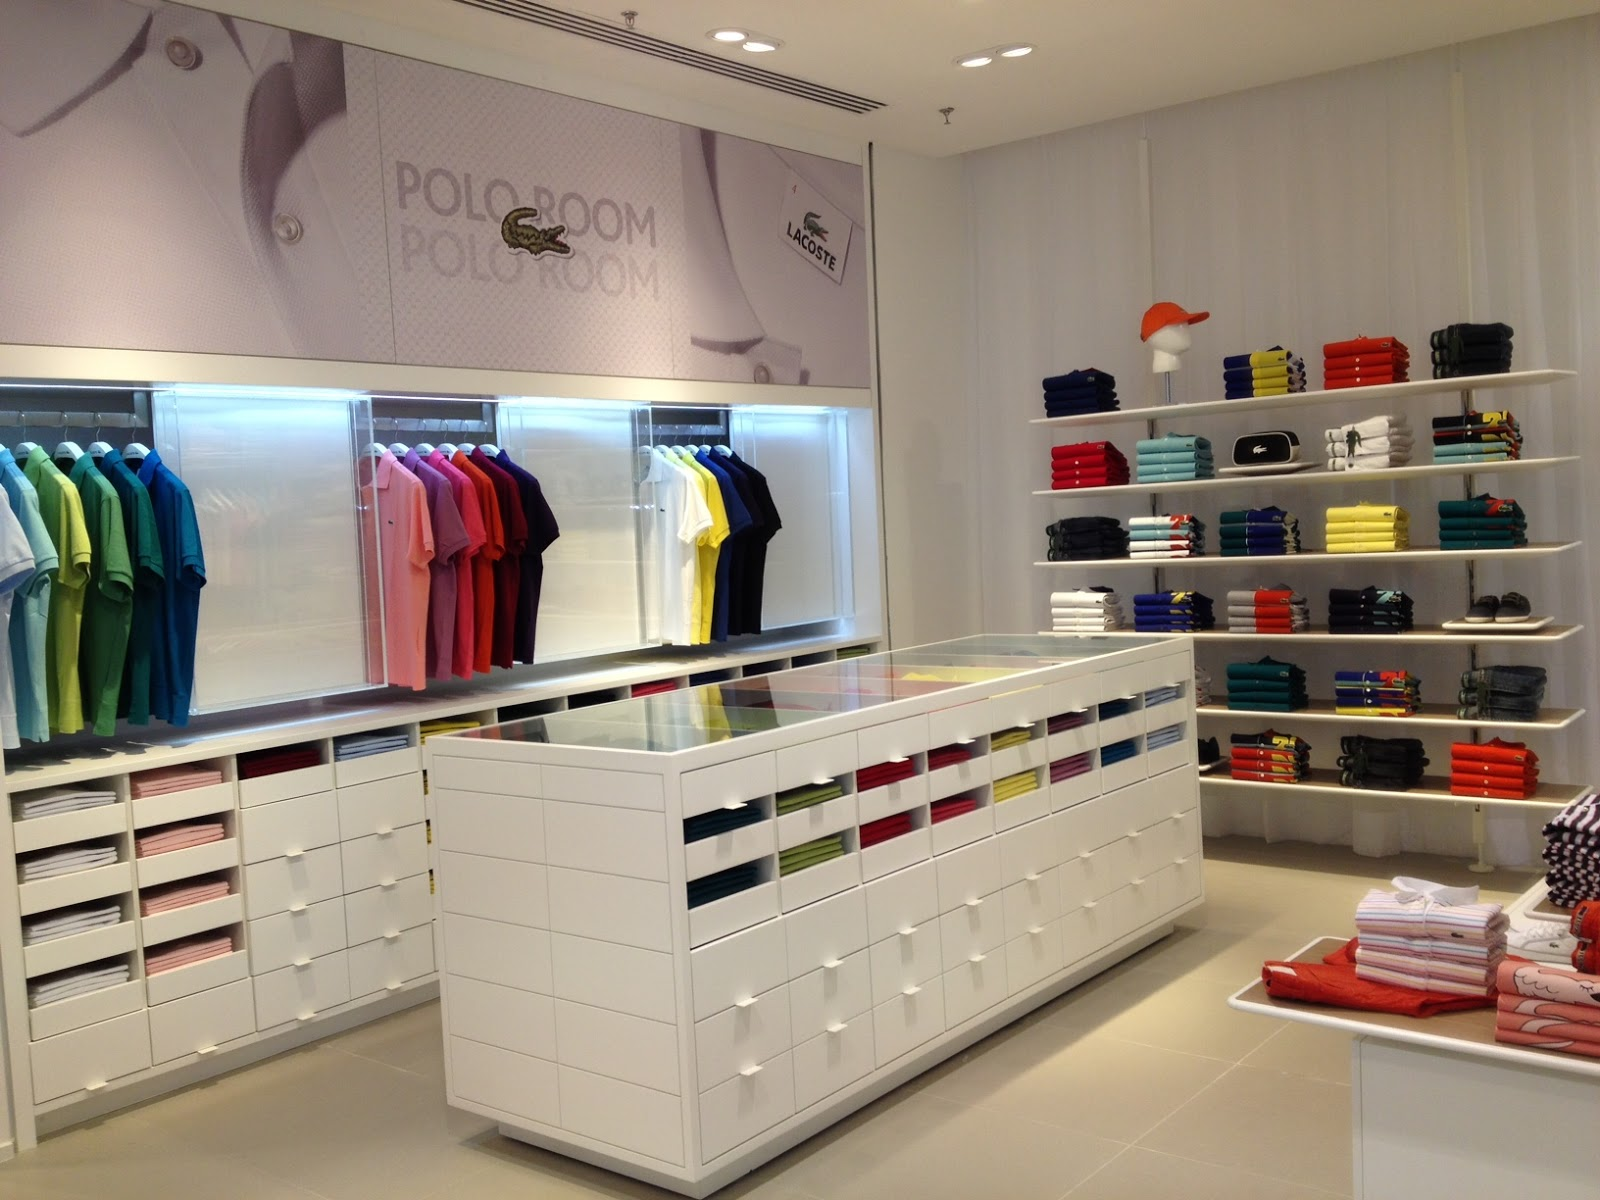 528d1b8157b16 Exclusividade Blog daLullu  Lacoste inaugura nova loja no Shopping ...